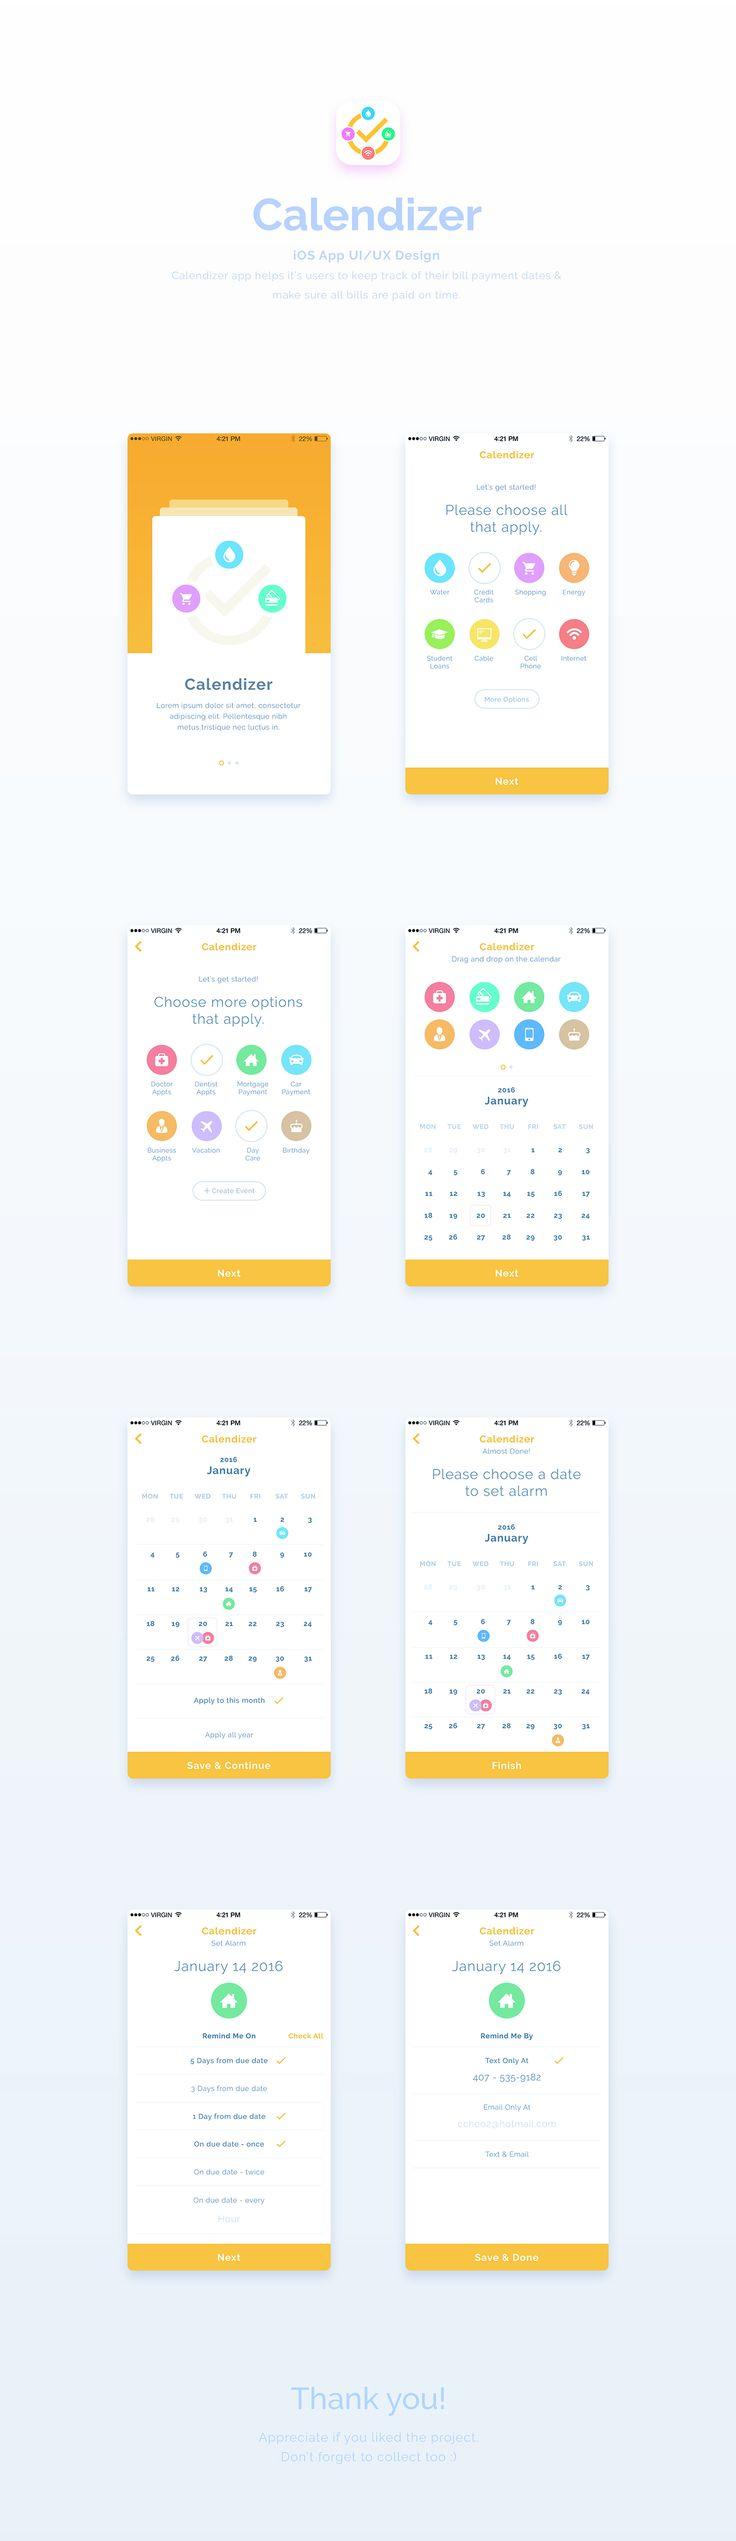 Calendizer | App UI / UX Design on Behance